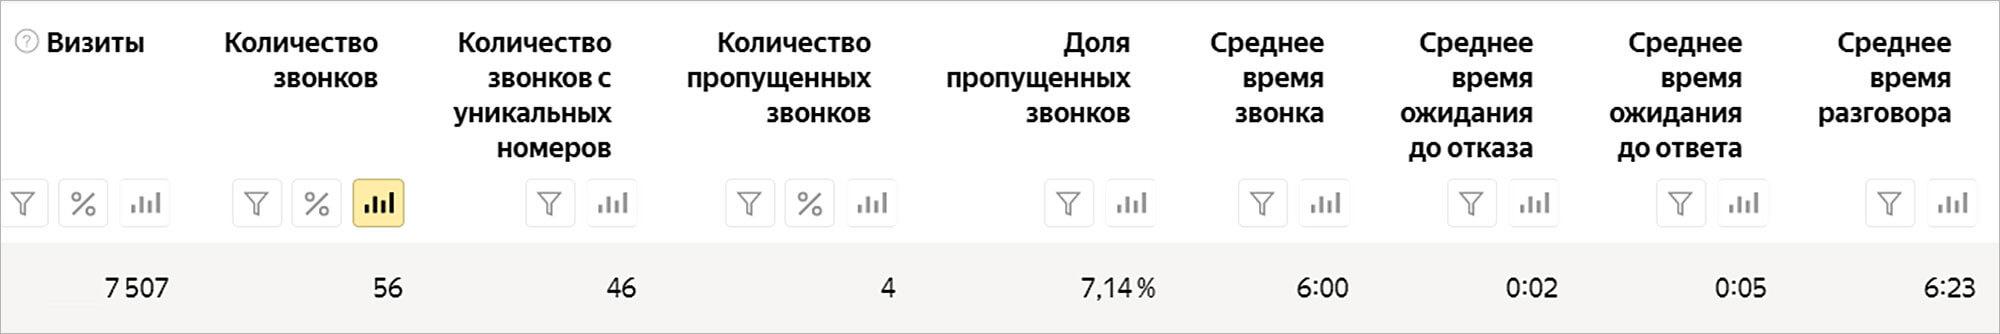 Статистика по звонкам в Яндекс.Метрике